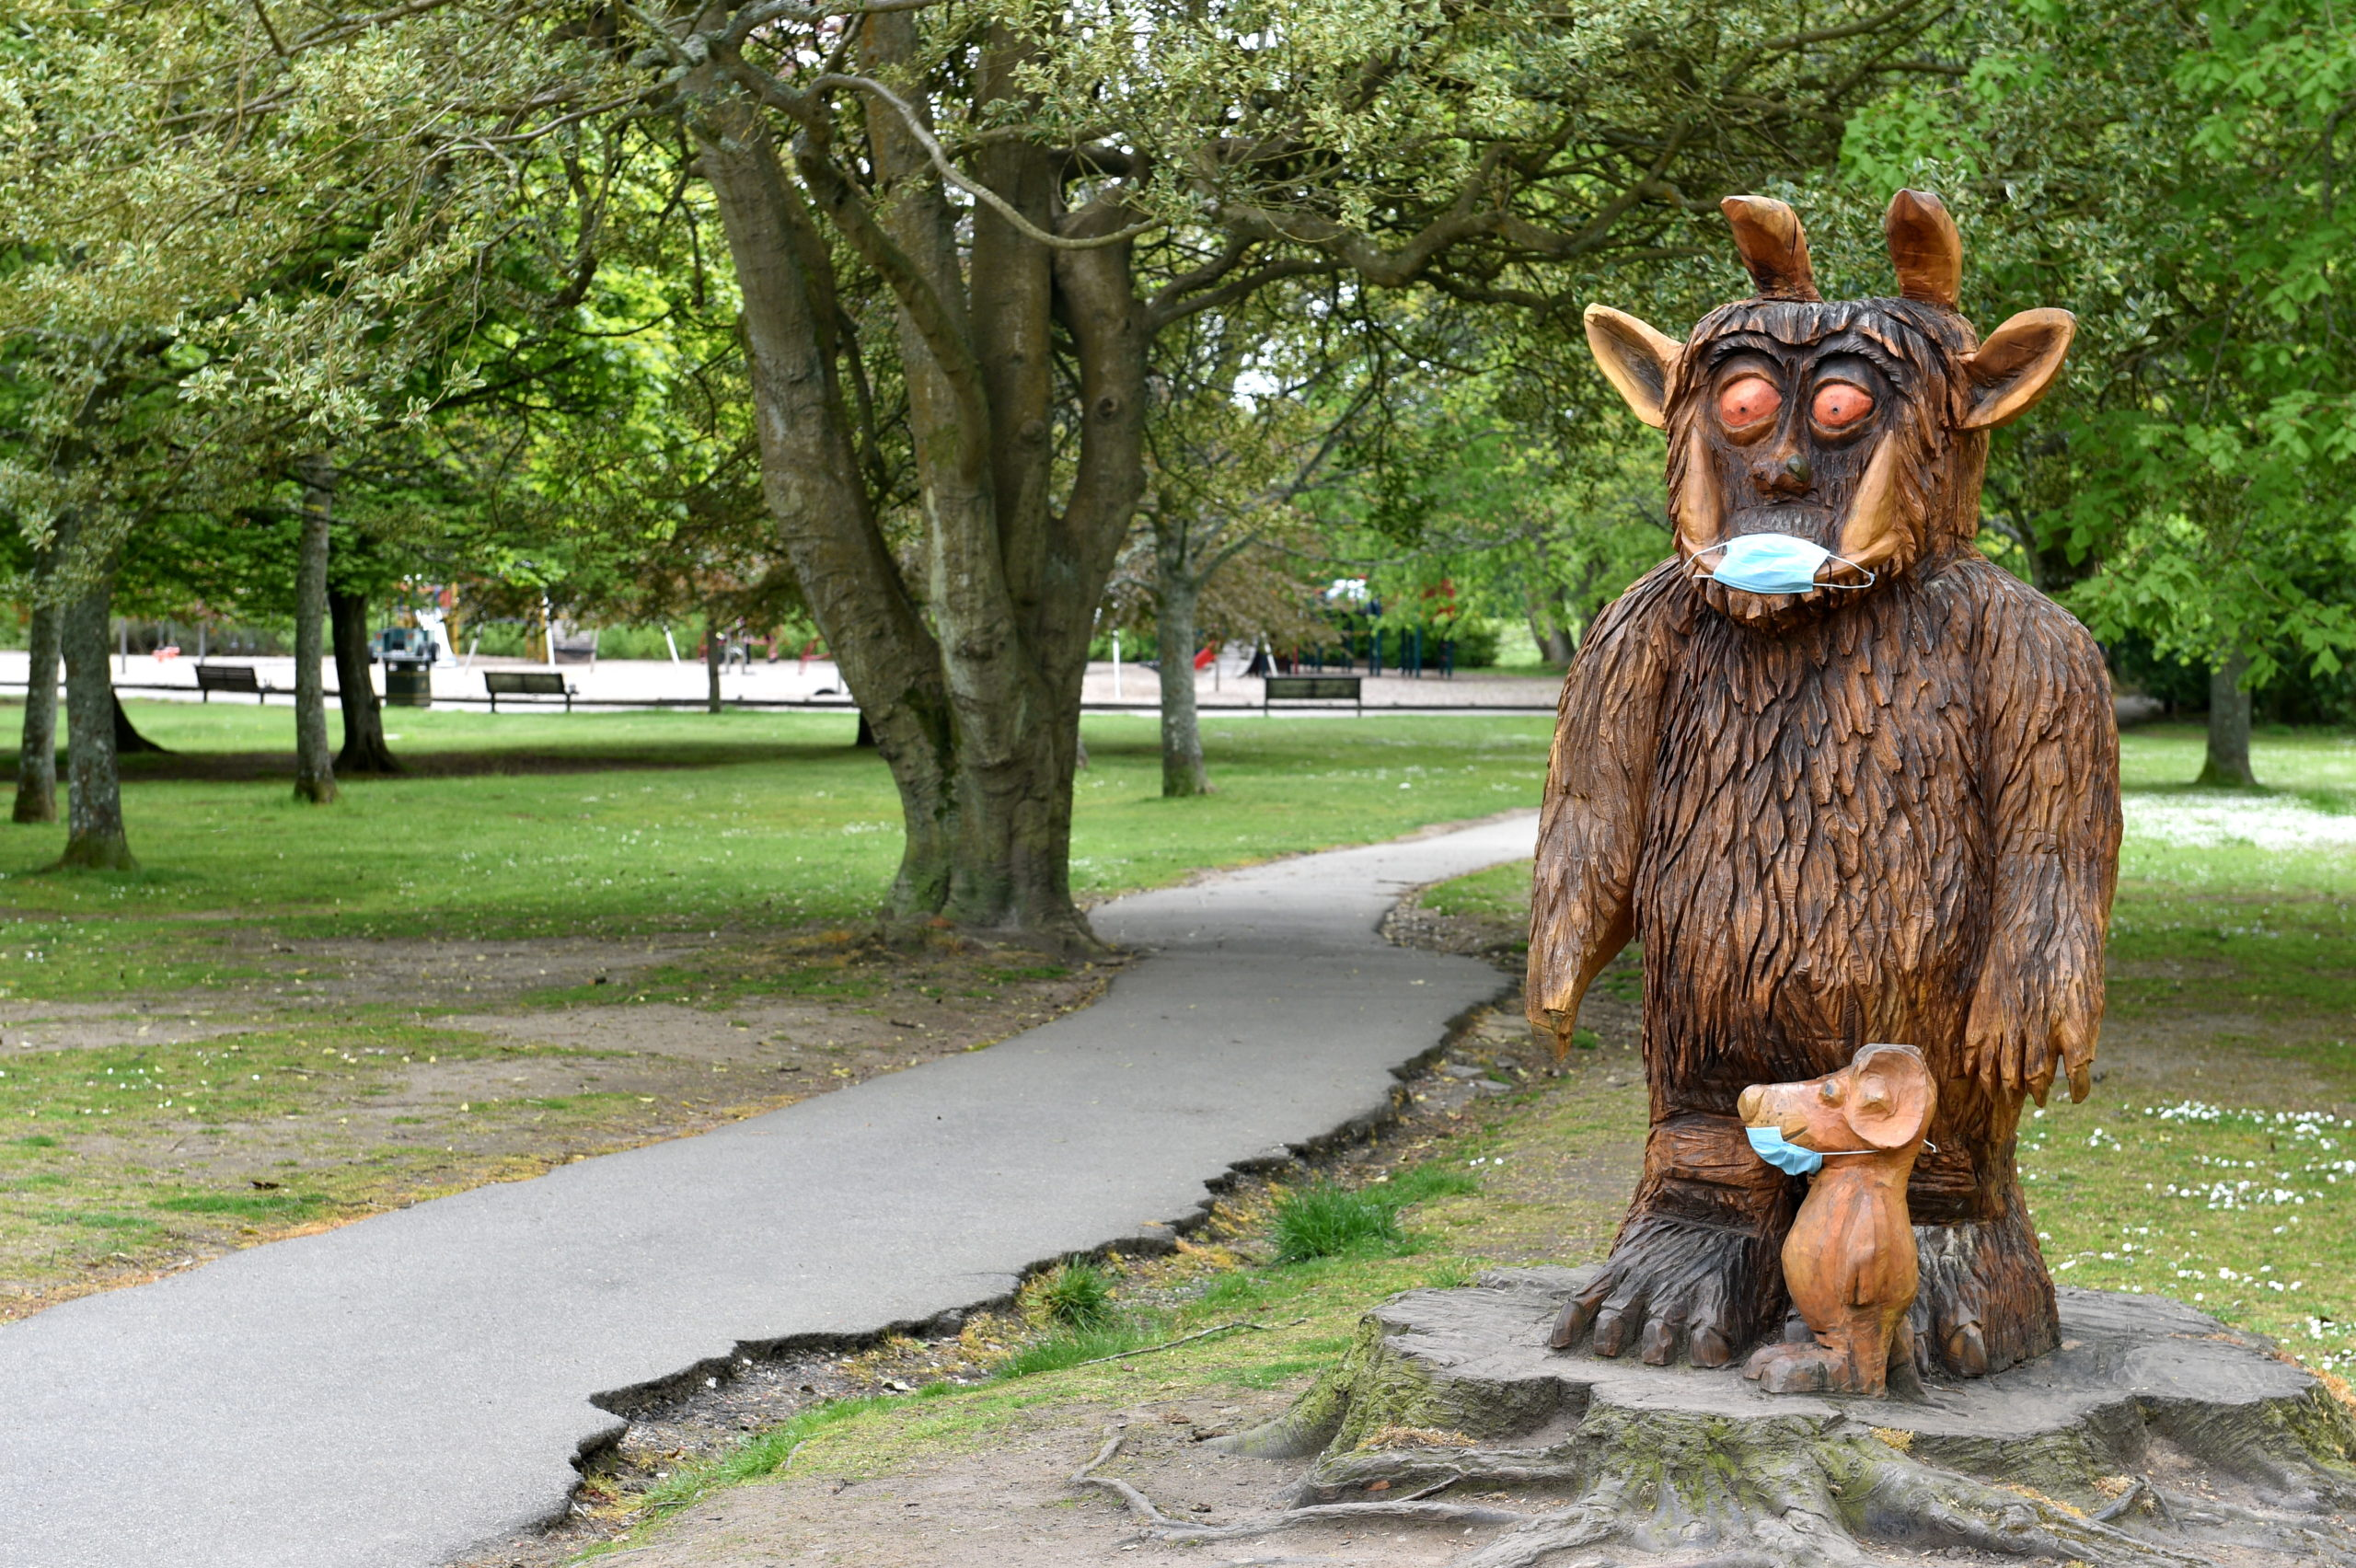 Gruffalo statue in Hazlehead Park, Aberdeen. Picture by DARRELL BENNS